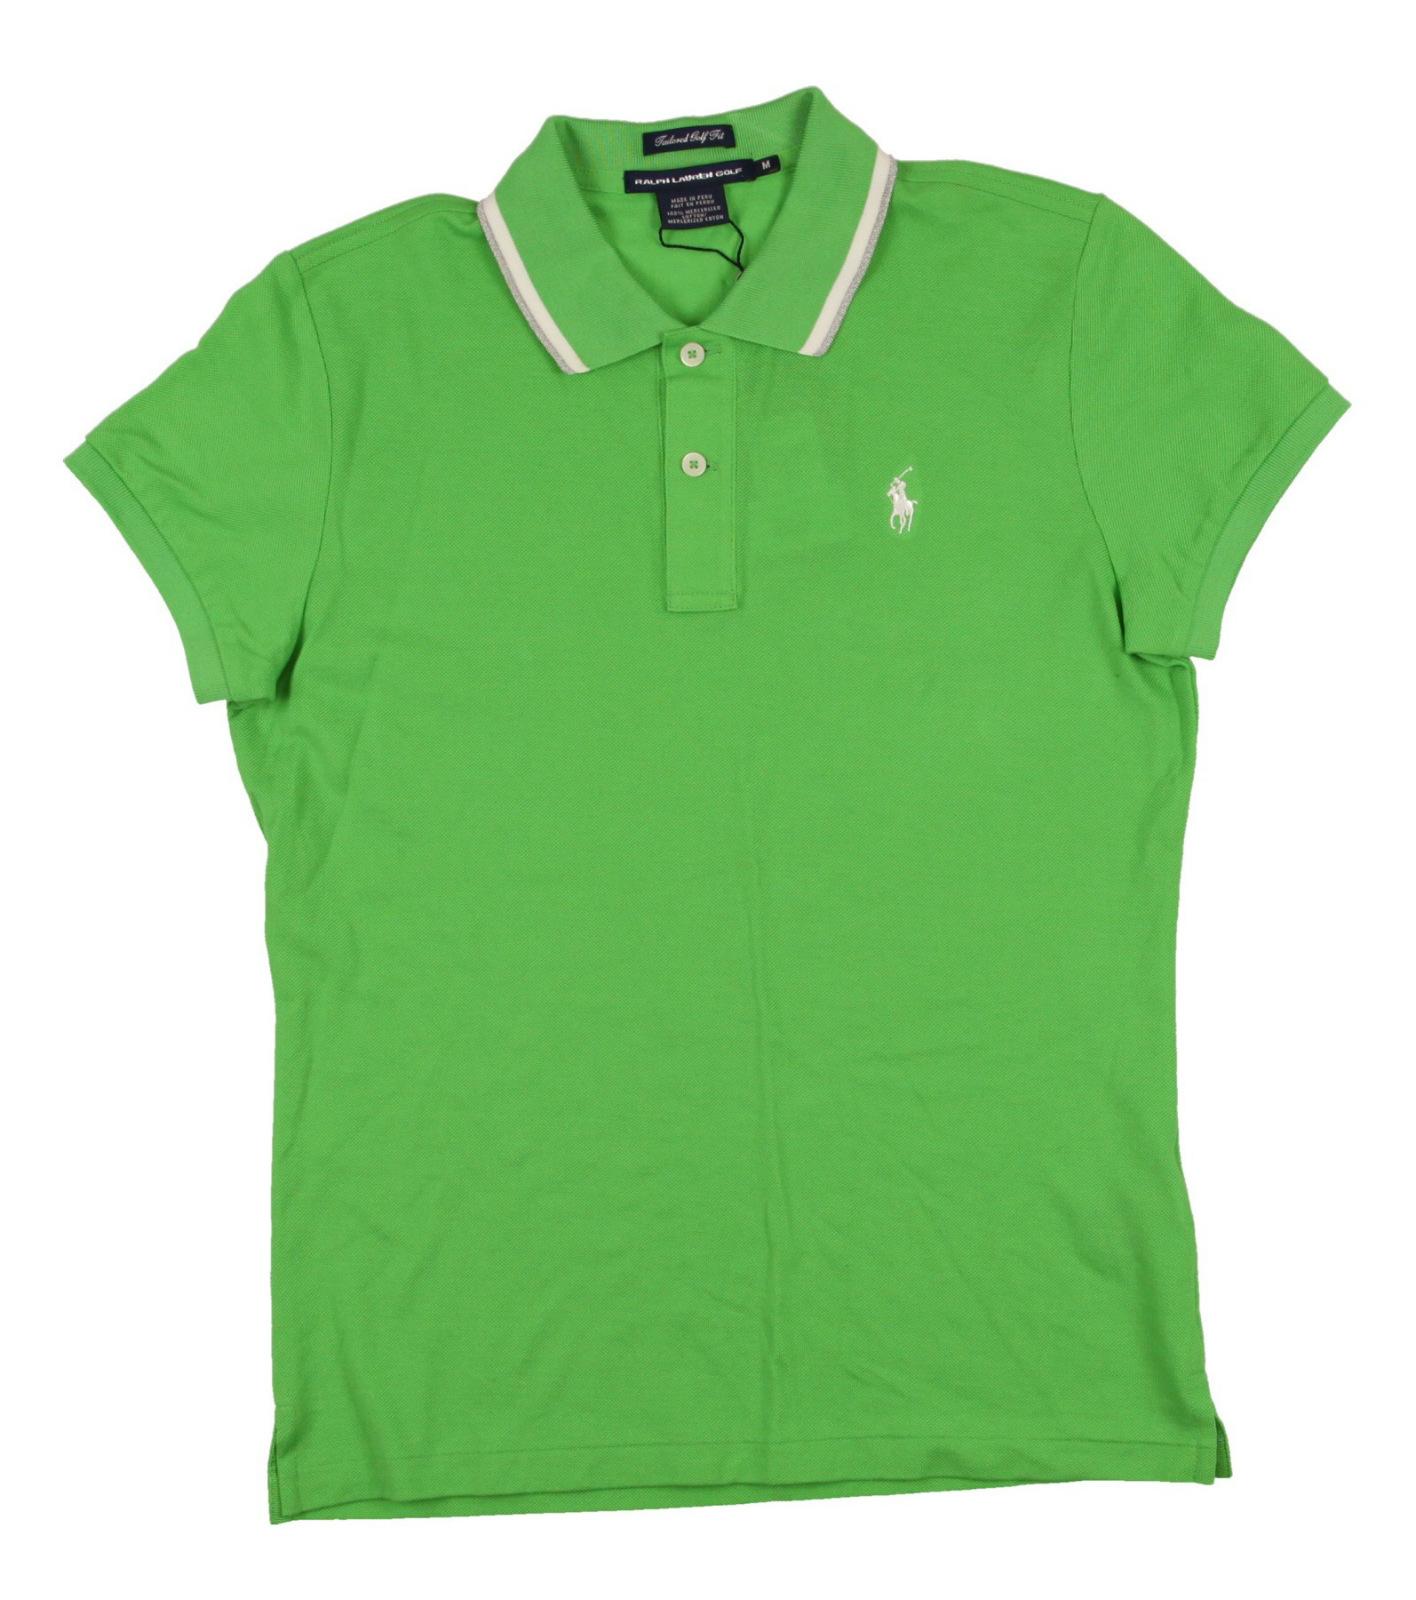 new women 39 s ralph lauren polo golf tailored fit ss golf. Black Bedroom Furniture Sets. Home Design Ideas